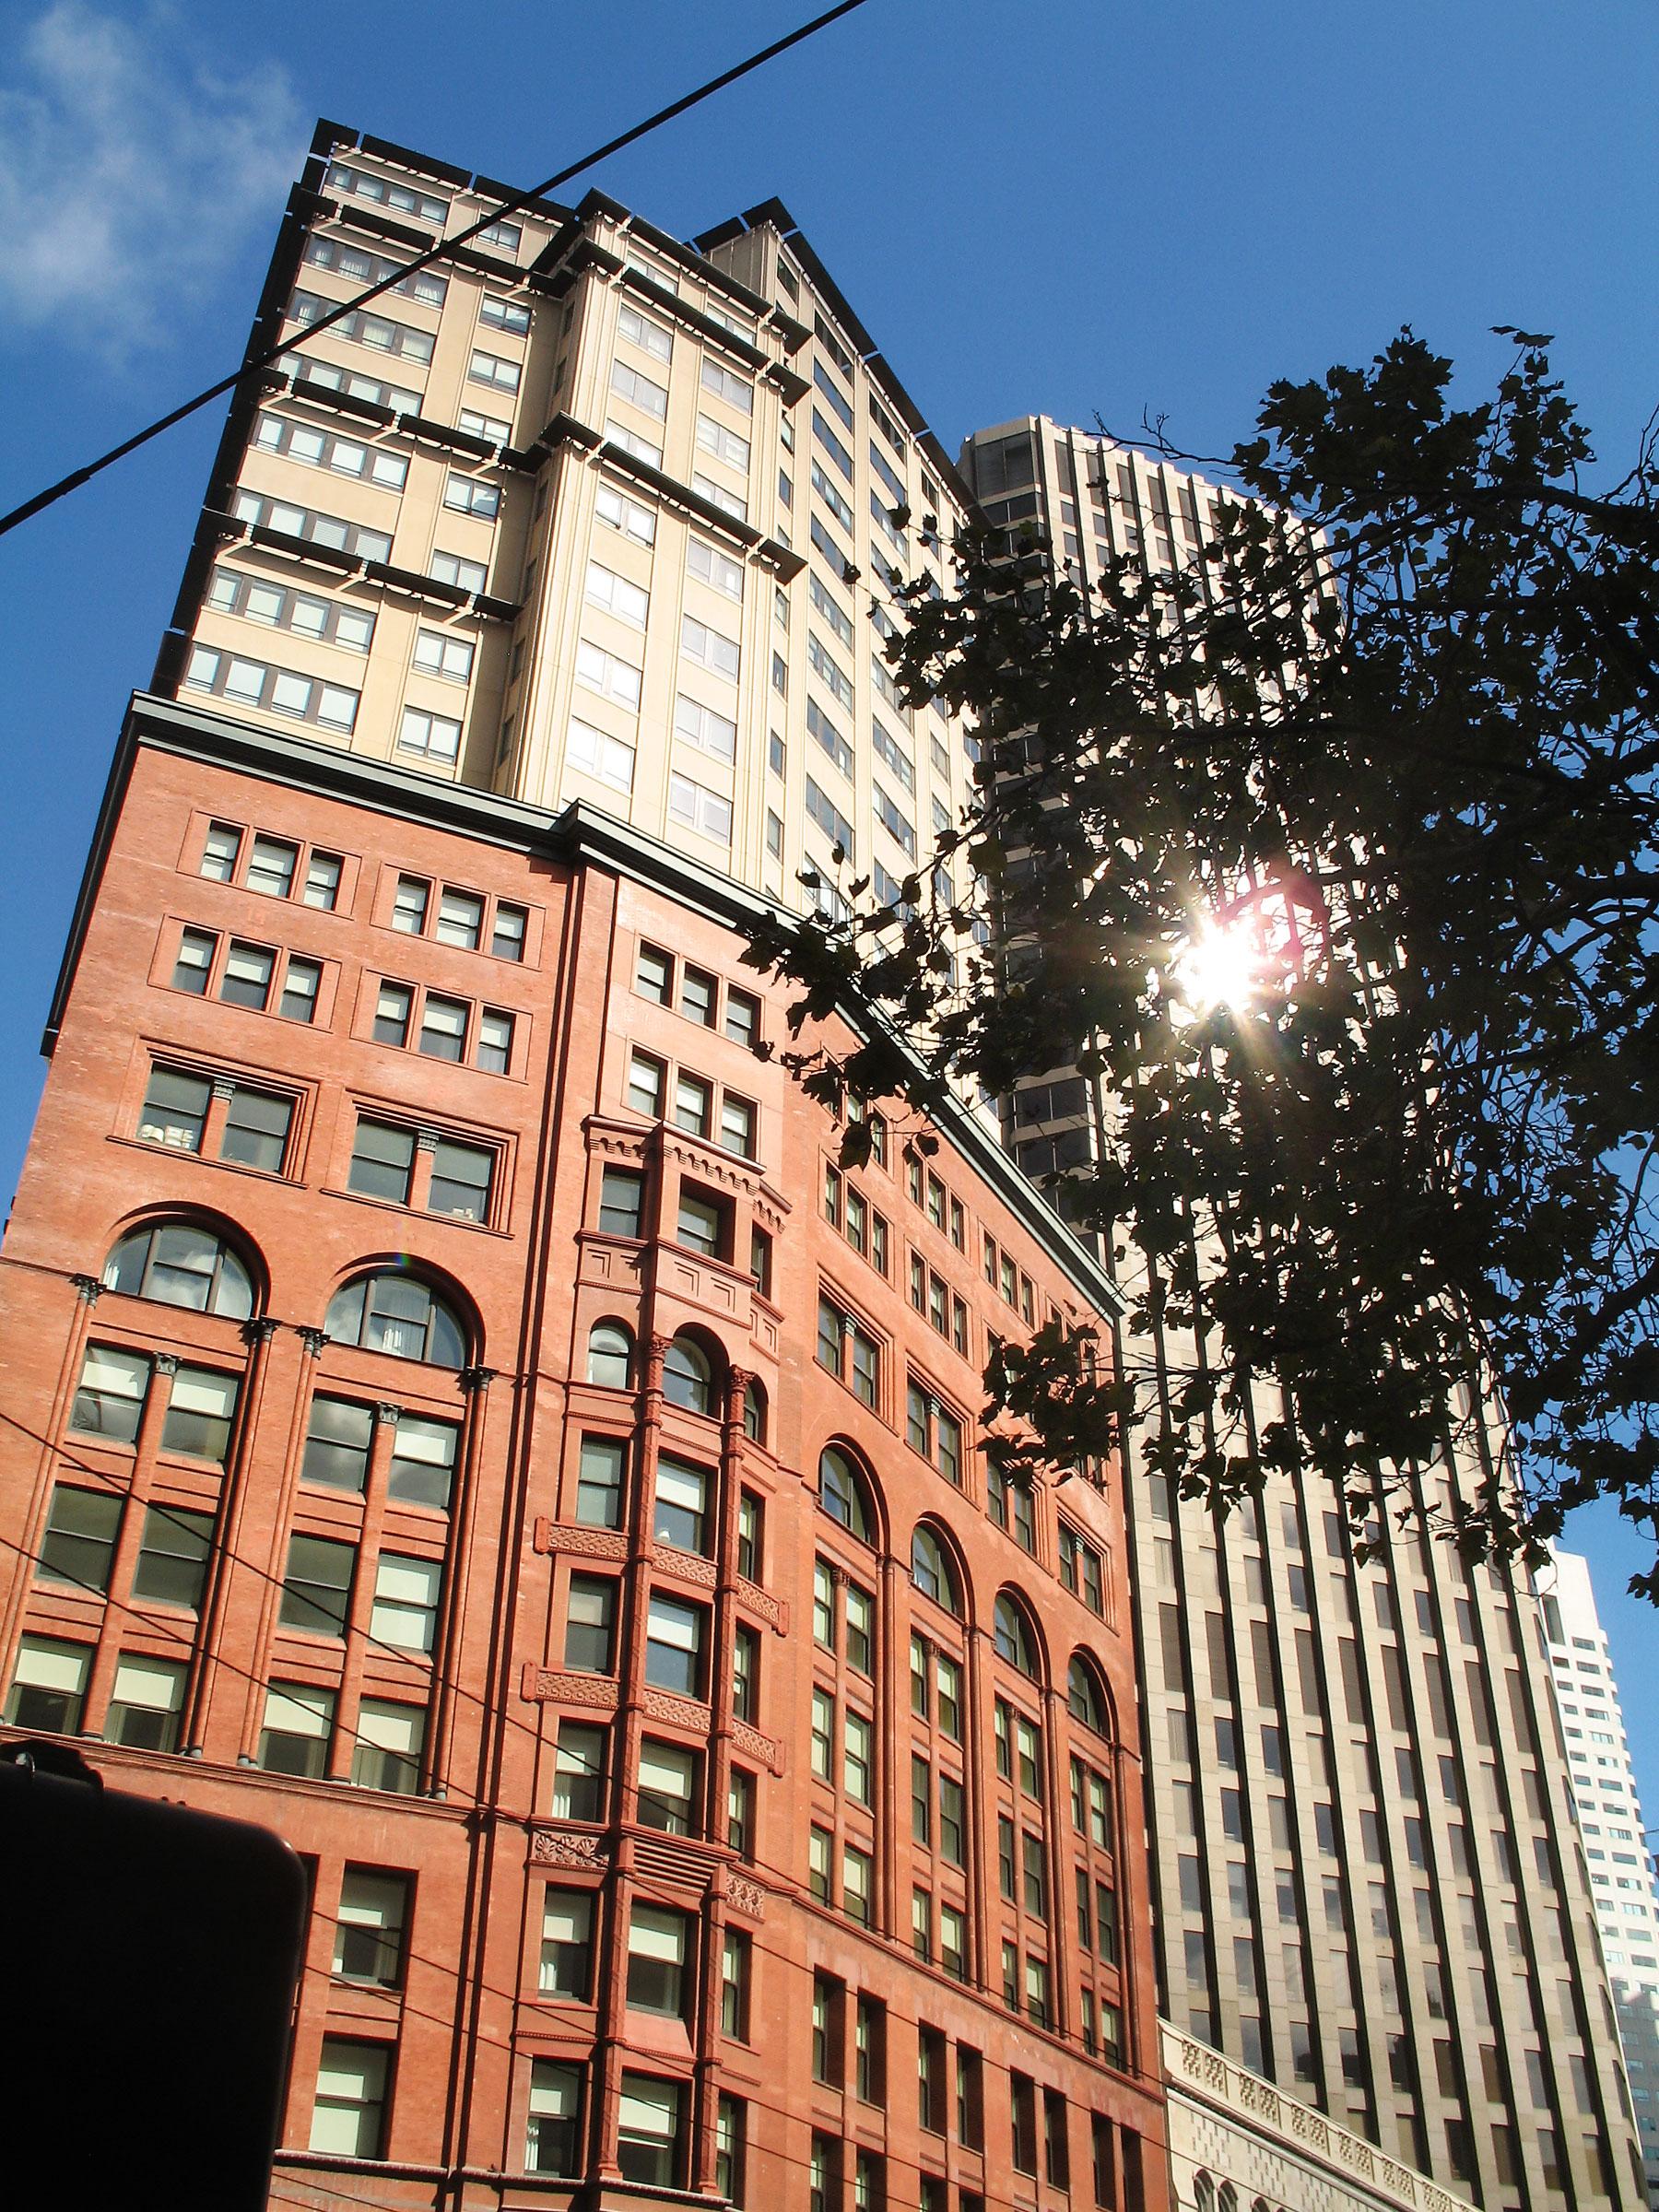 Facade of Ritz-Carlton Residencestower on Market Street.